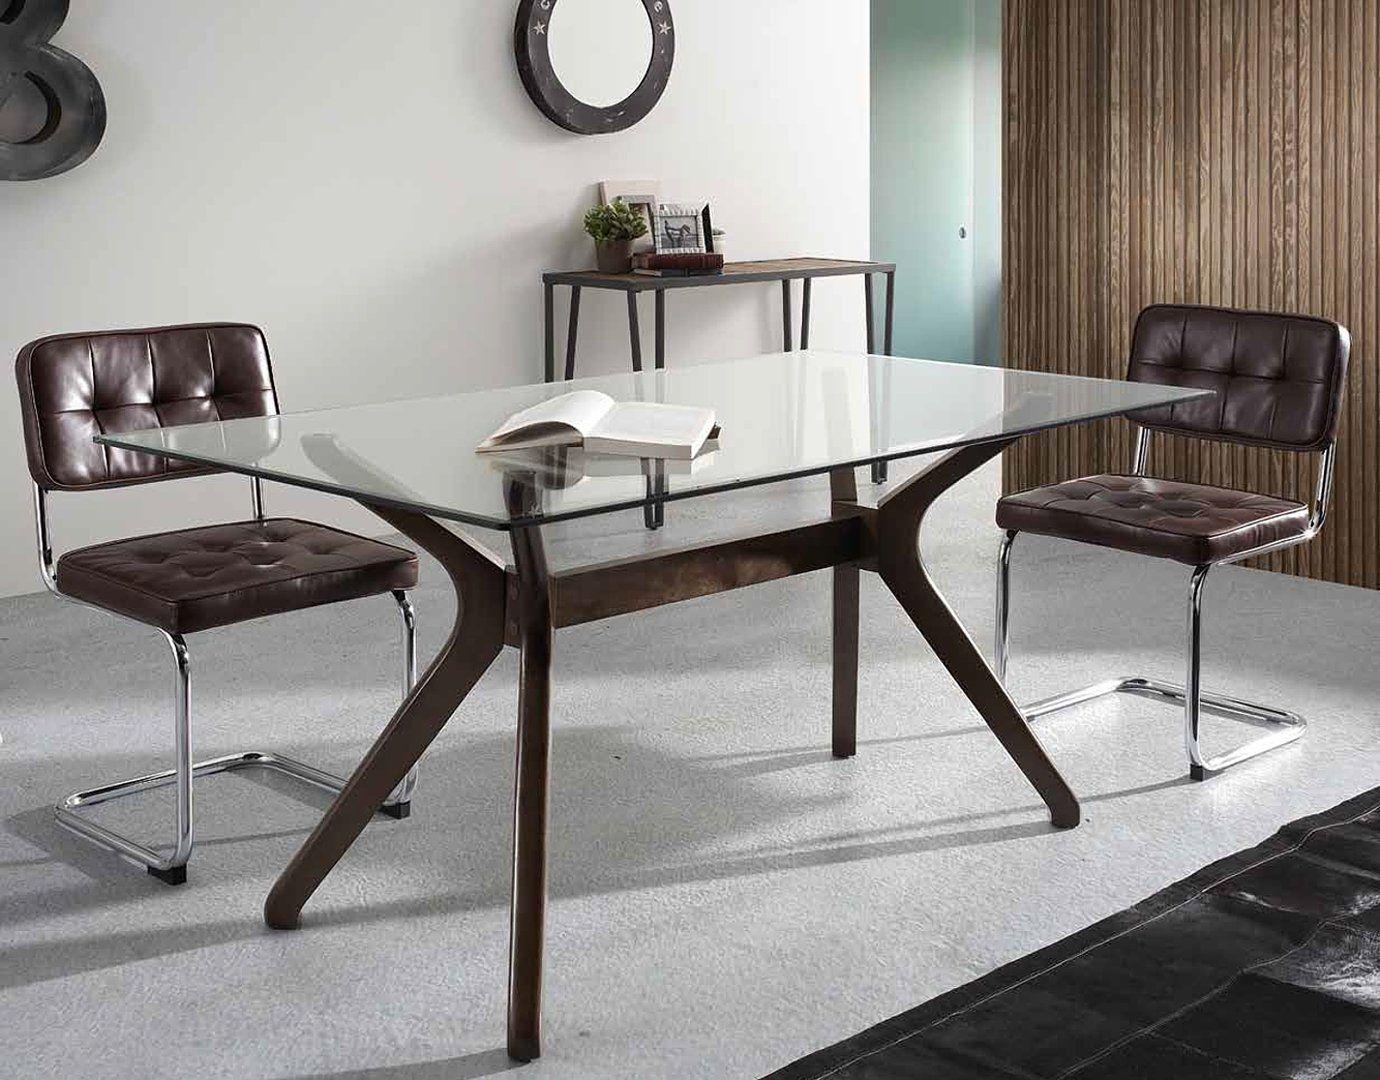 Mesa de comedor cristal olaf vintage muebles decorar for Mesa salon comedor